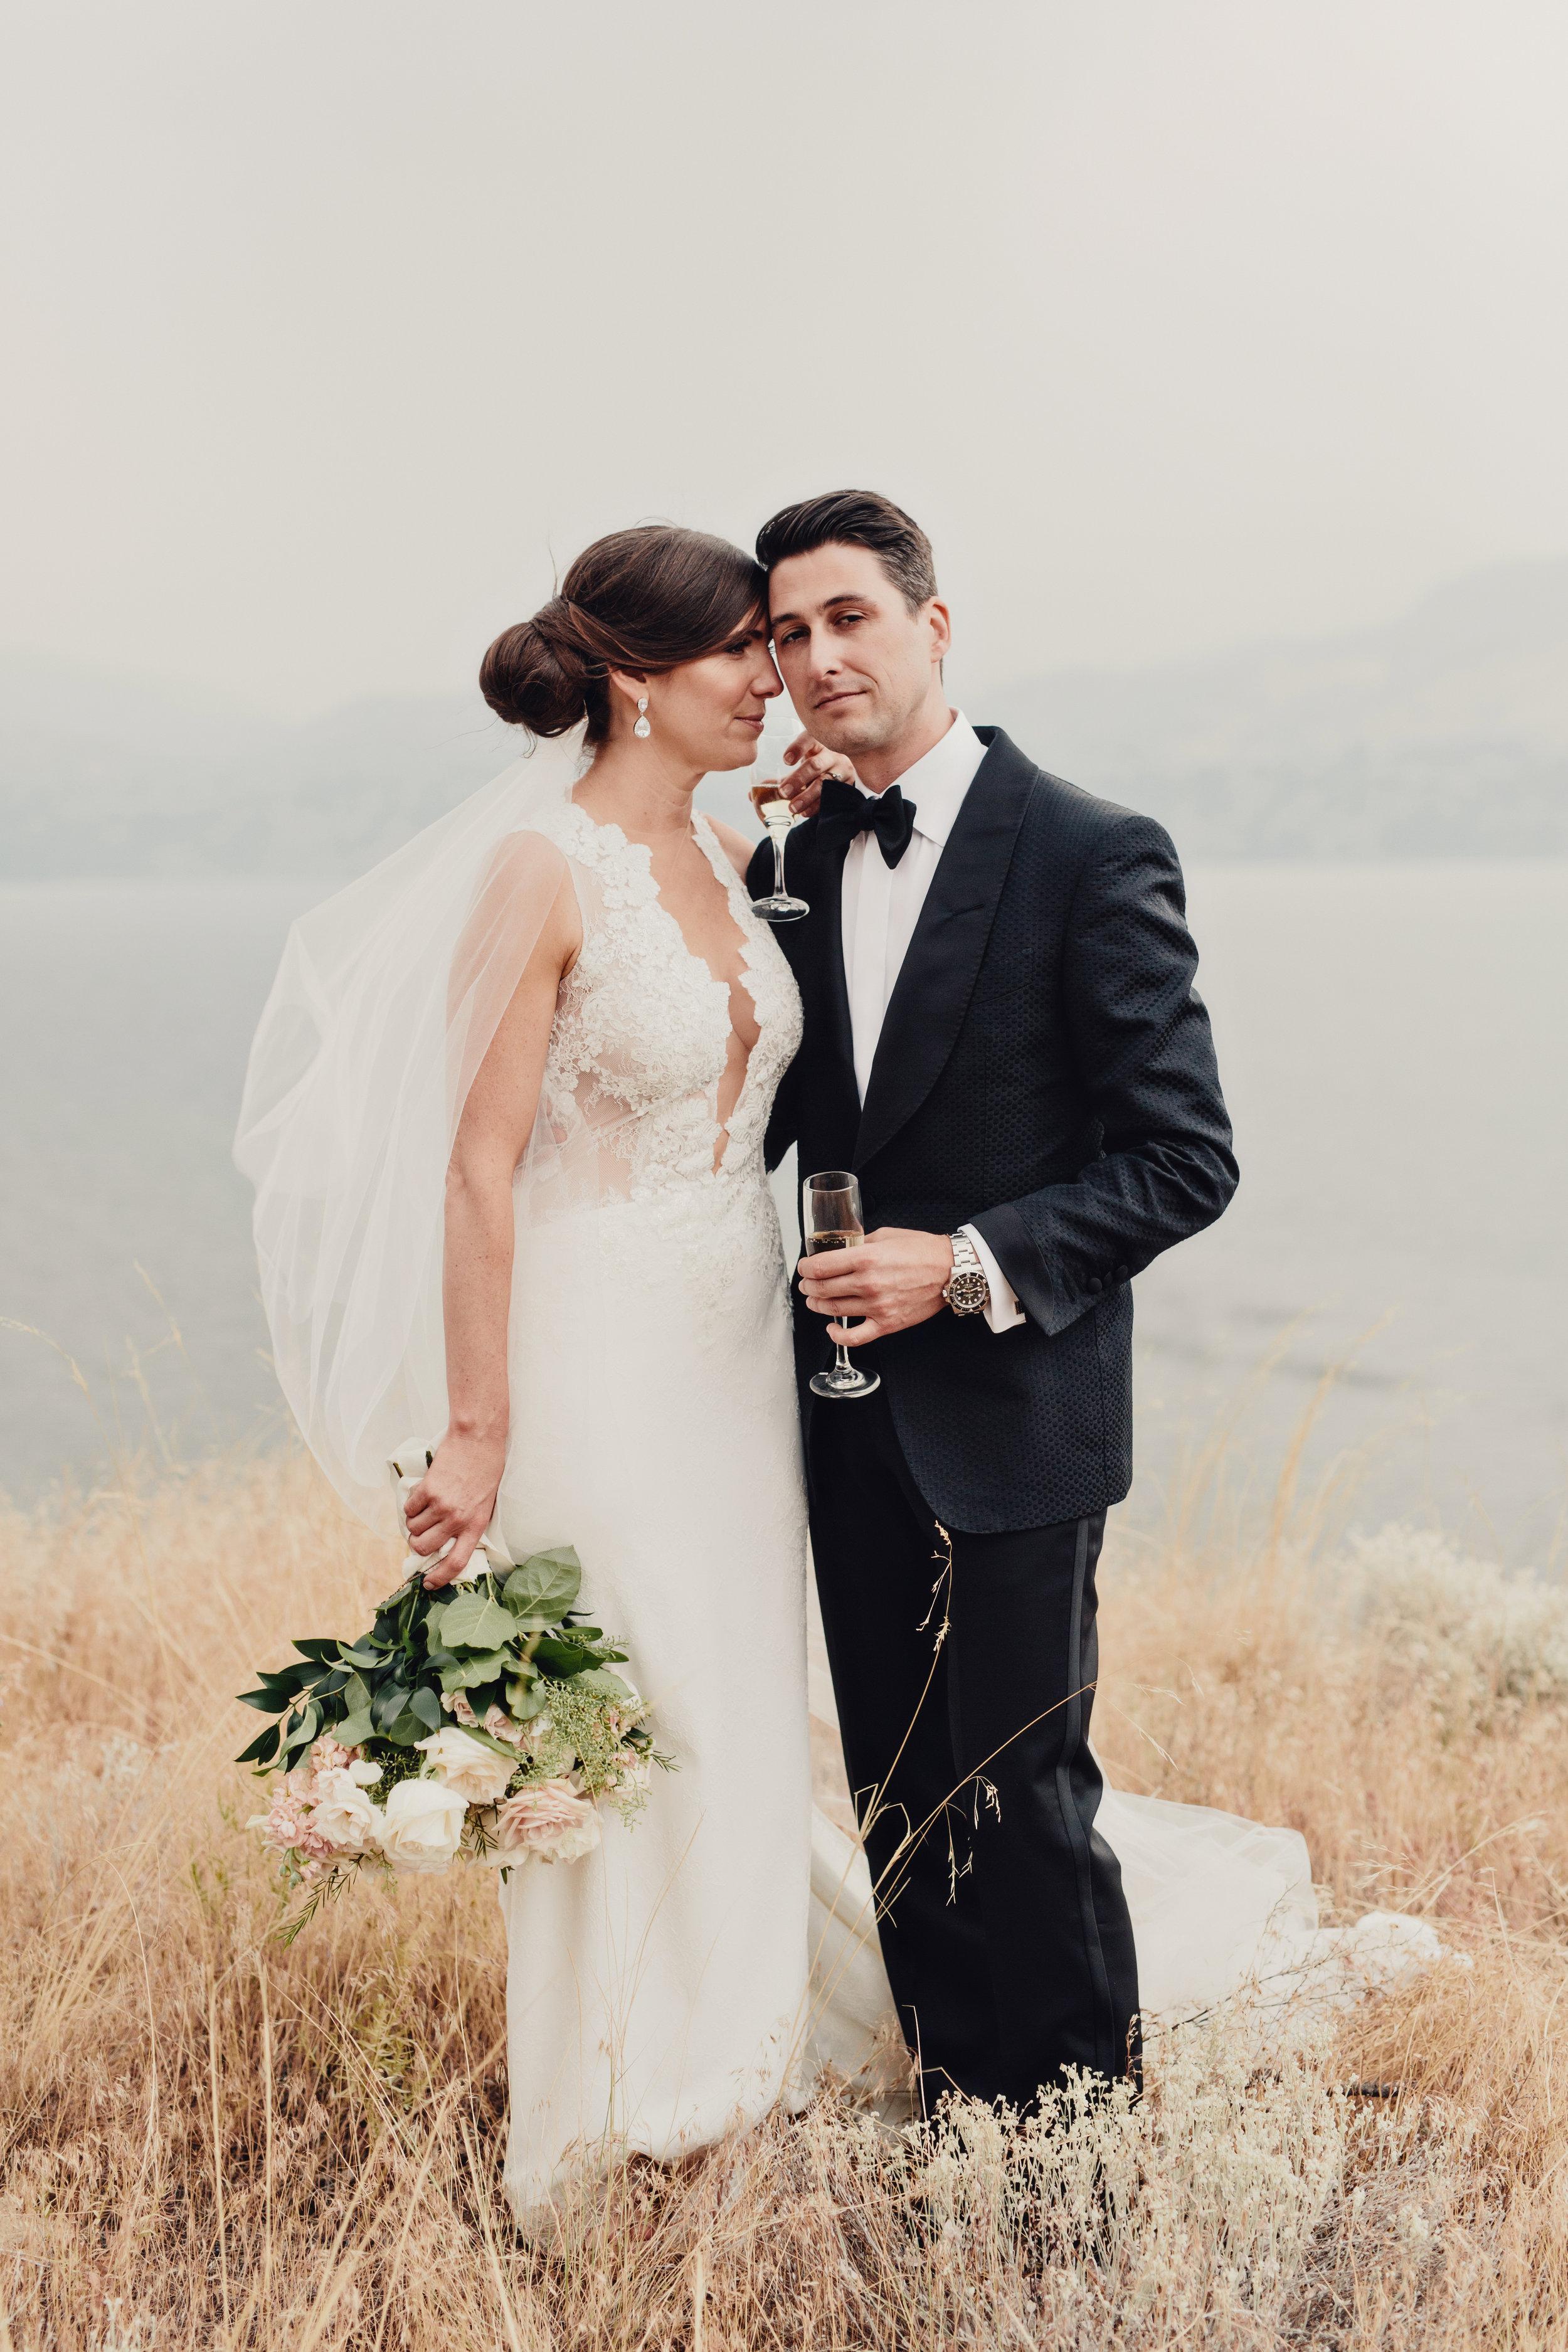 taylor-roades-wedding-0089.JPG